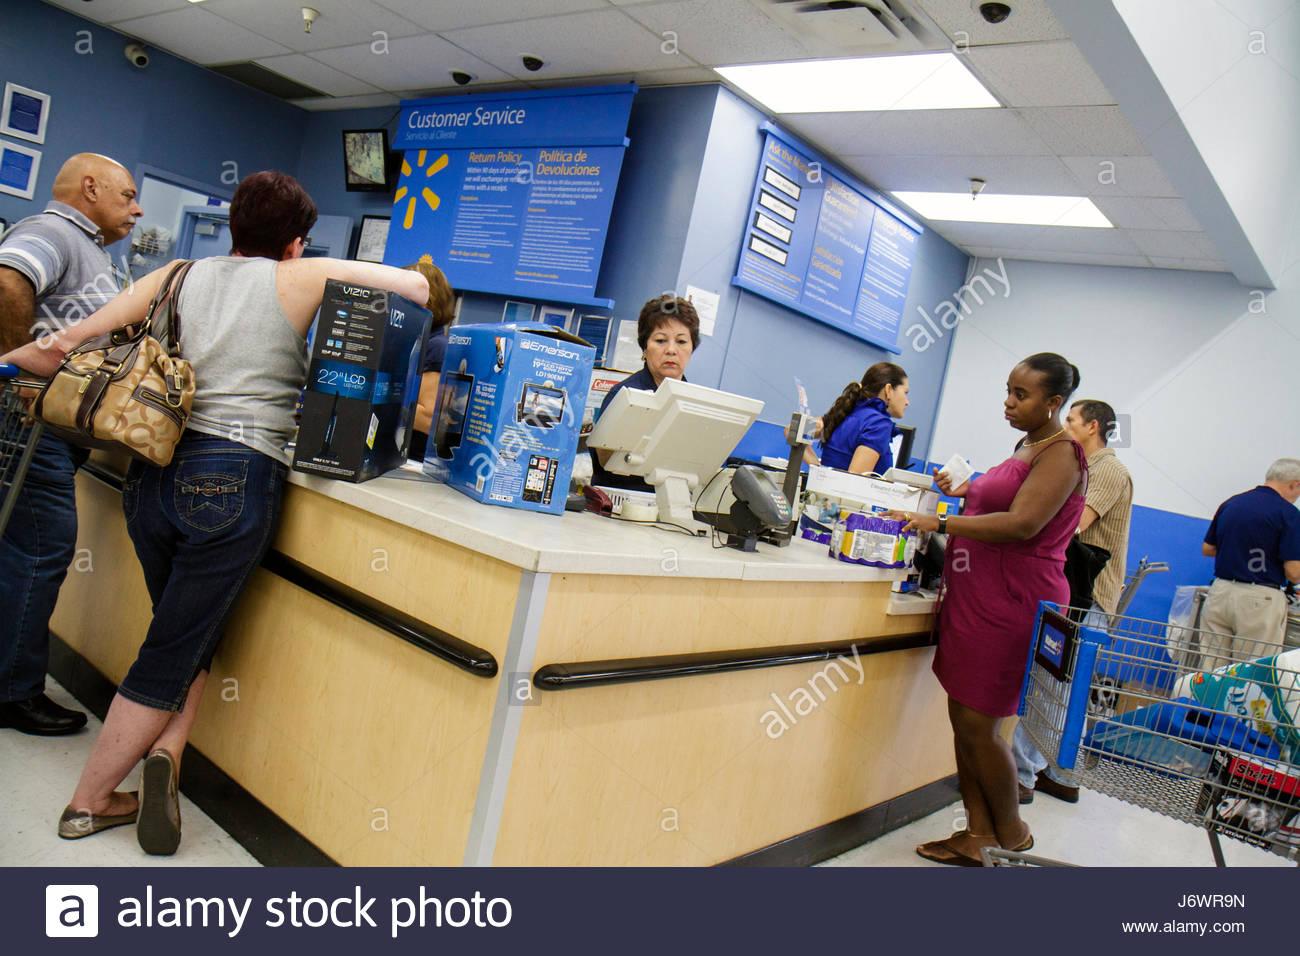 Customer service and walmart